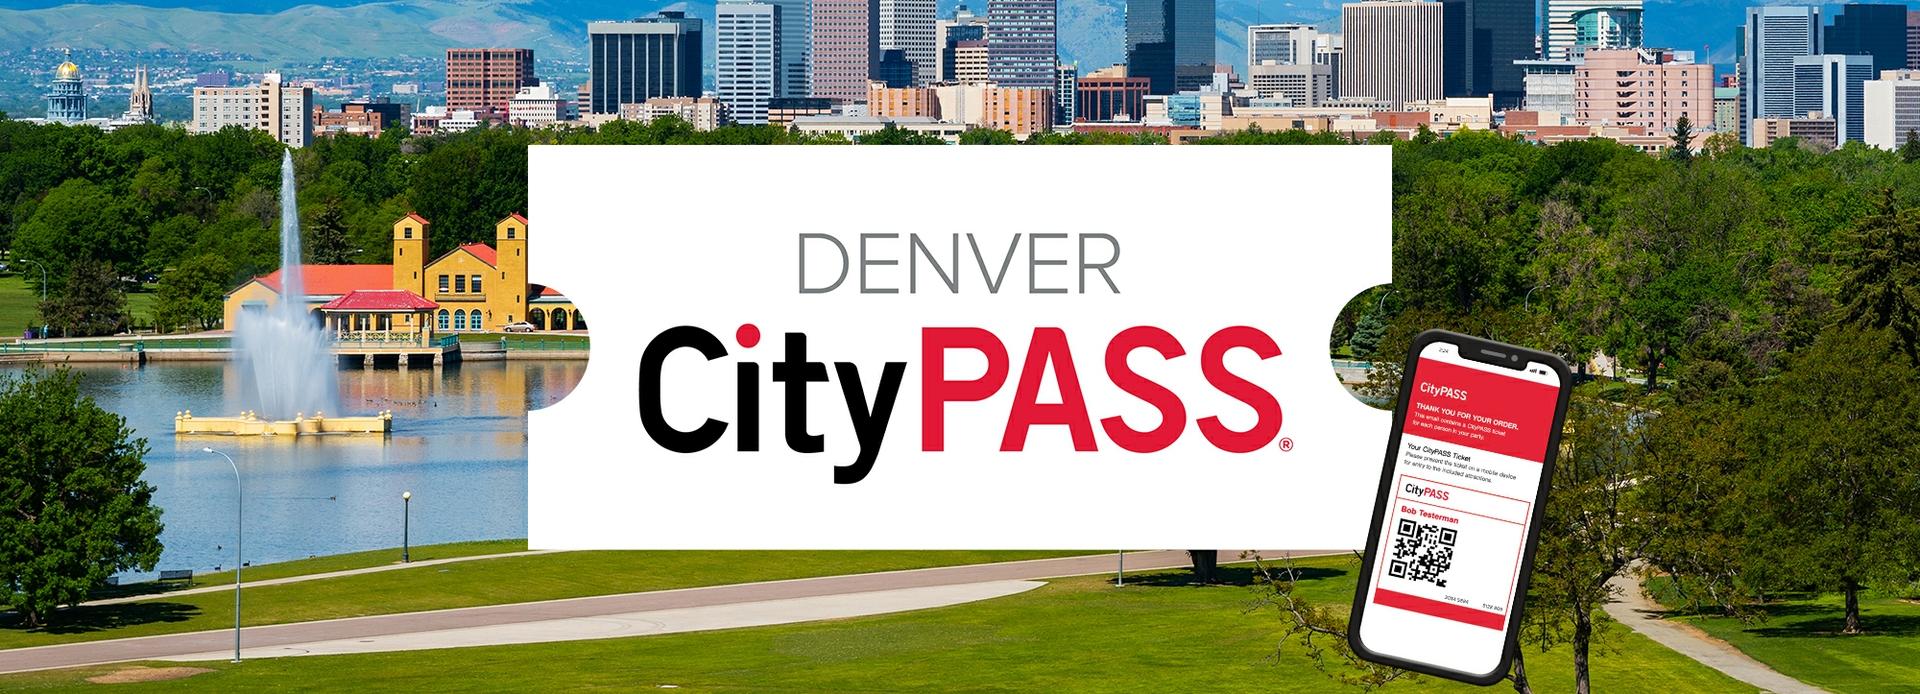 2021-2022 Denver CityPASS®  C3, C4, & C5